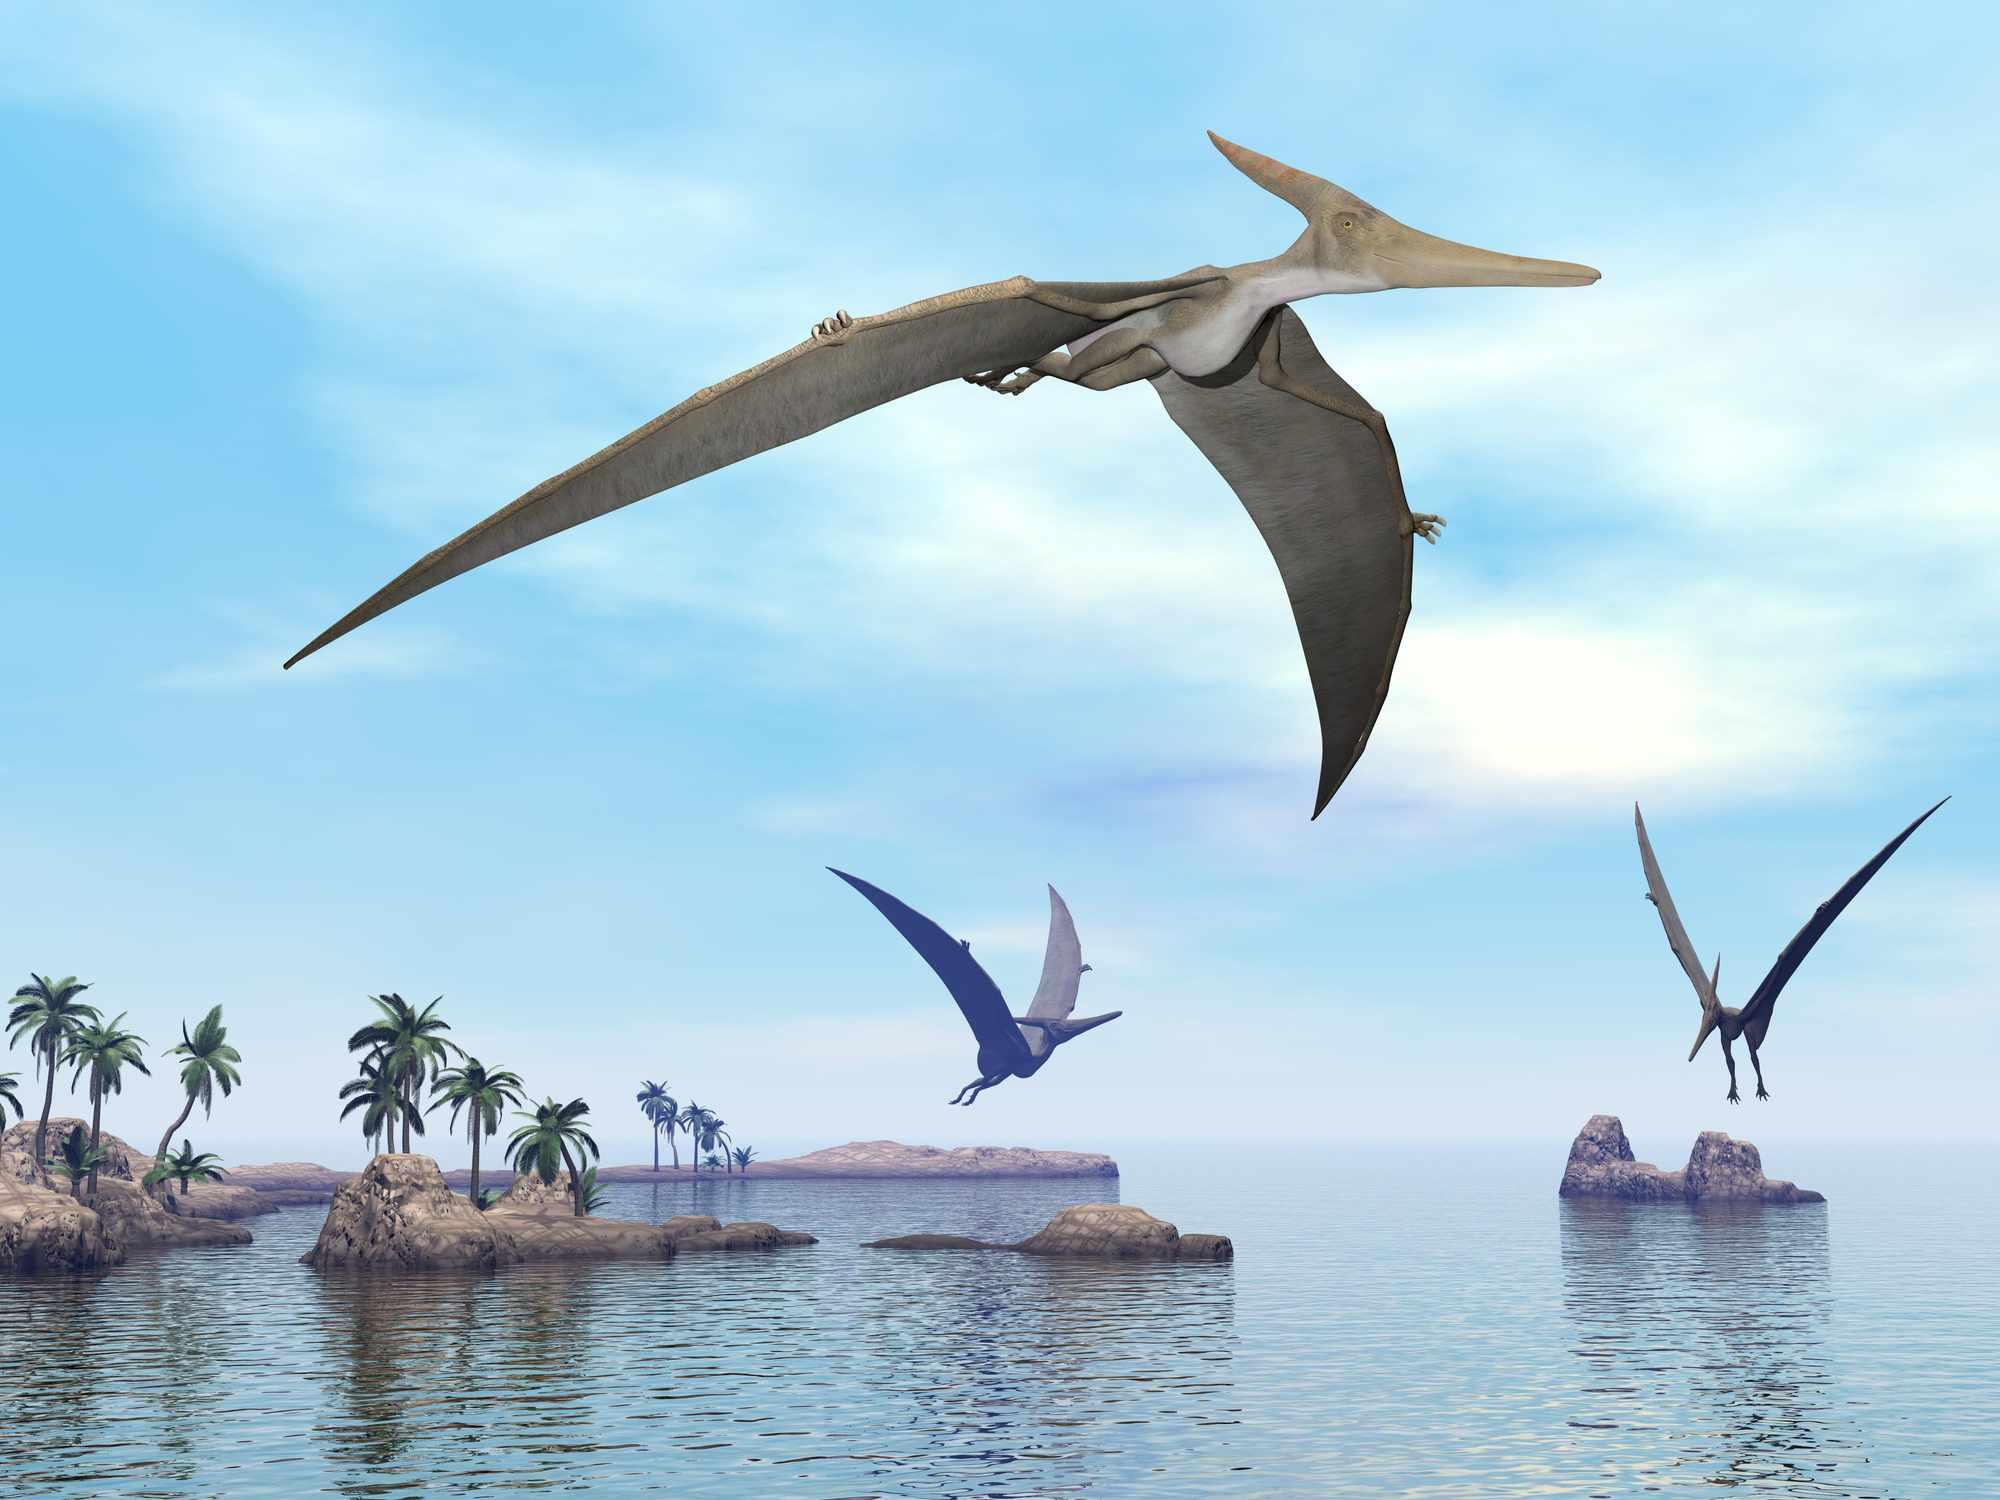 Dinosaurios Pteranodon volando - 3D render